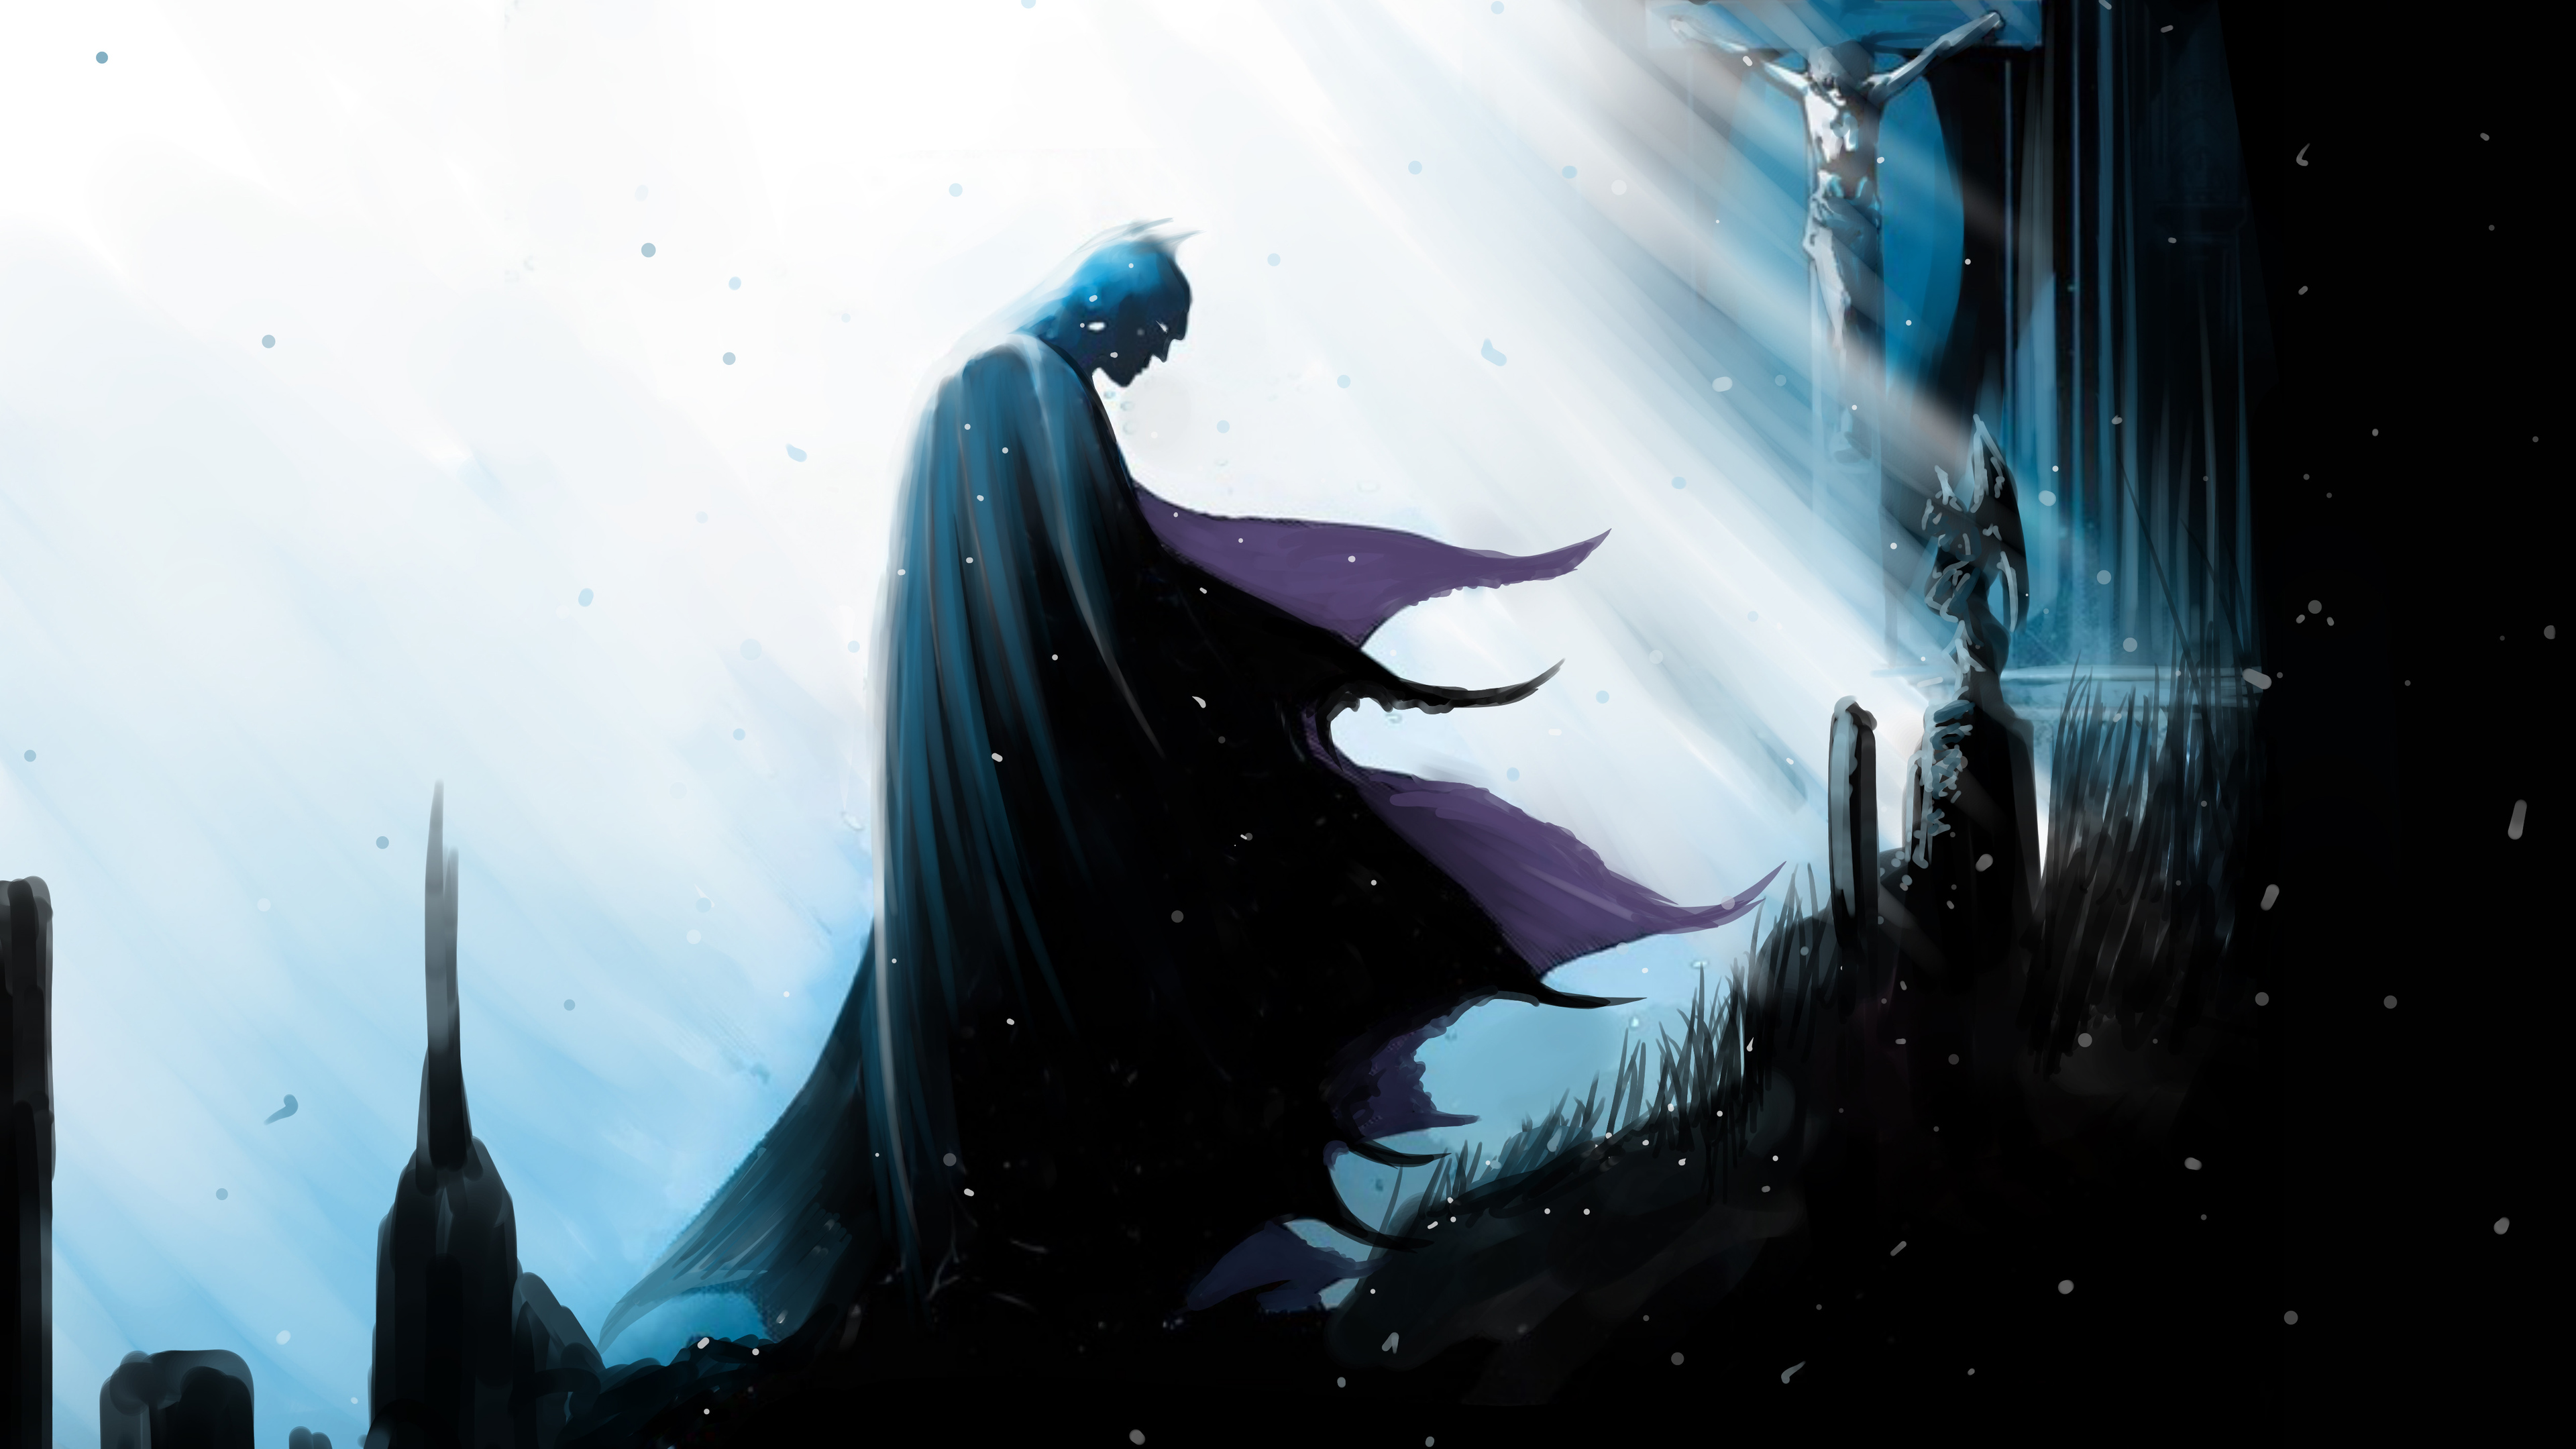 batman paint art 4k 1553071097 - Batman Paint Art 4k - superheroes wallpapers, hd-wallpapers, digital art wallpapers, batman wallpapers, artwork wallpapers, 4k-wallpapers